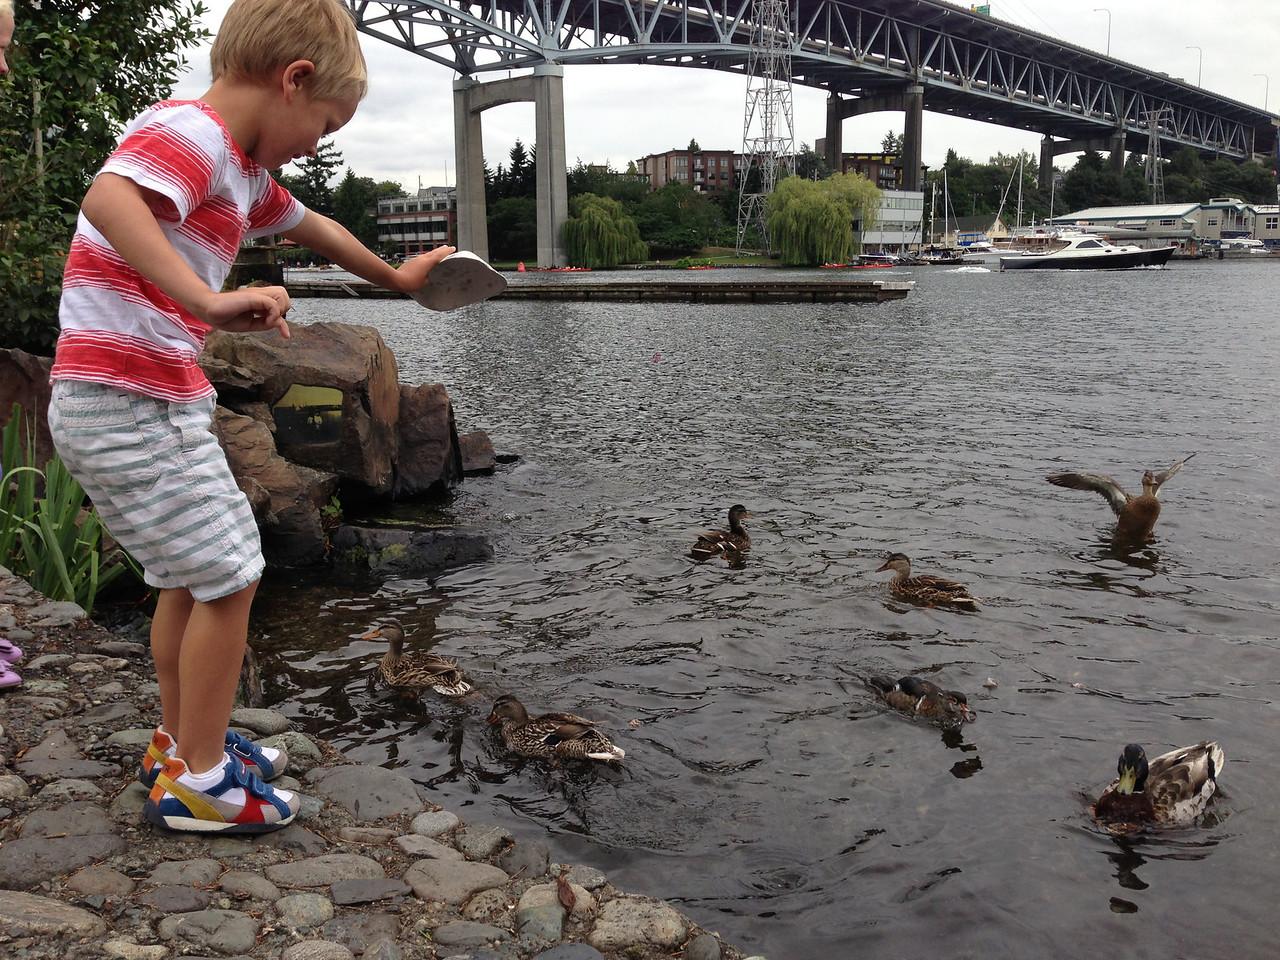 Feeding ducks the last of his fries in Lake Union